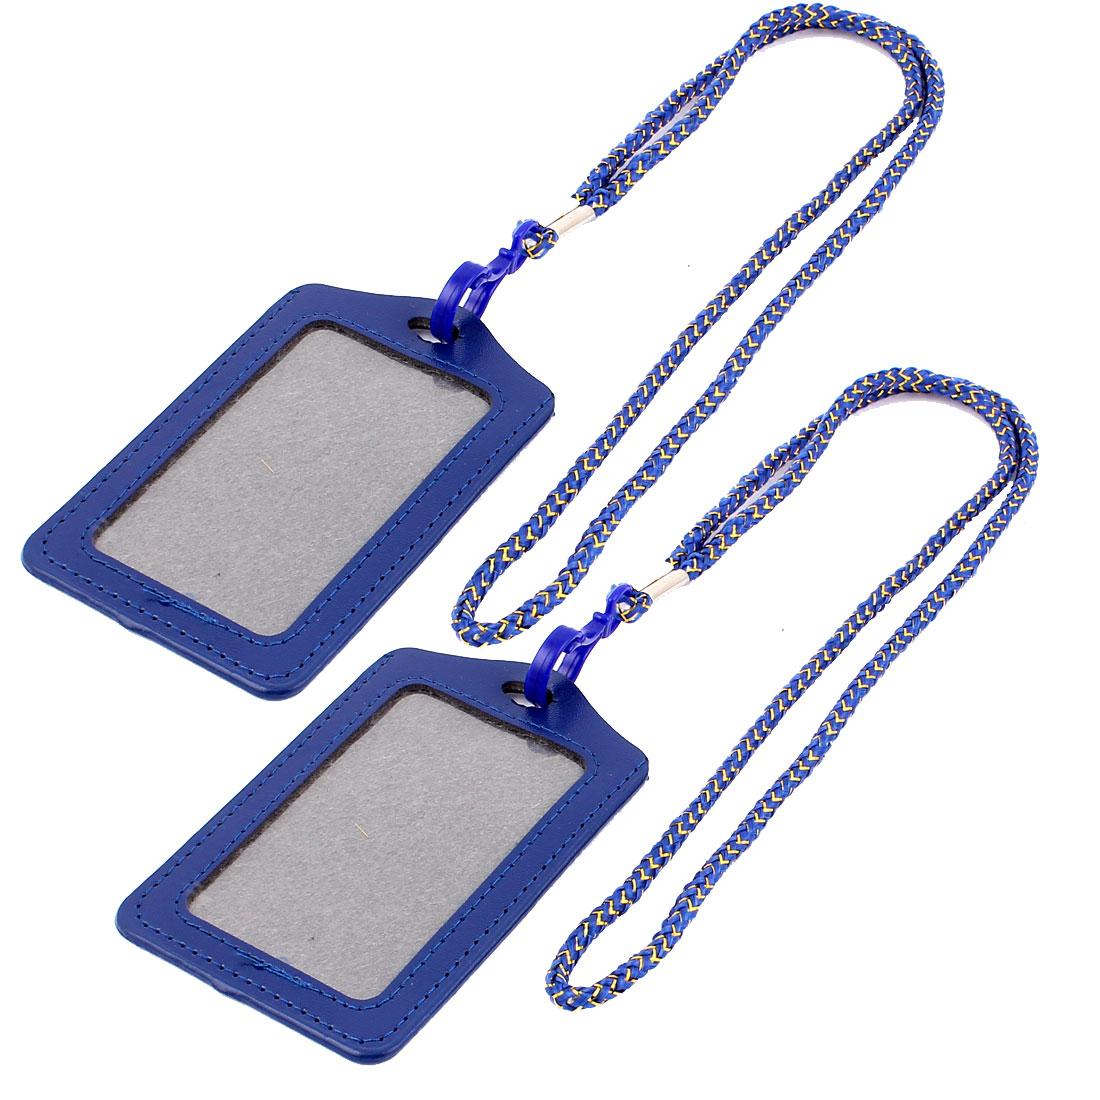 Nylon Neck Strap Name Badge Office Credit ID Card Vertical Holder Dark Blue 2PCS